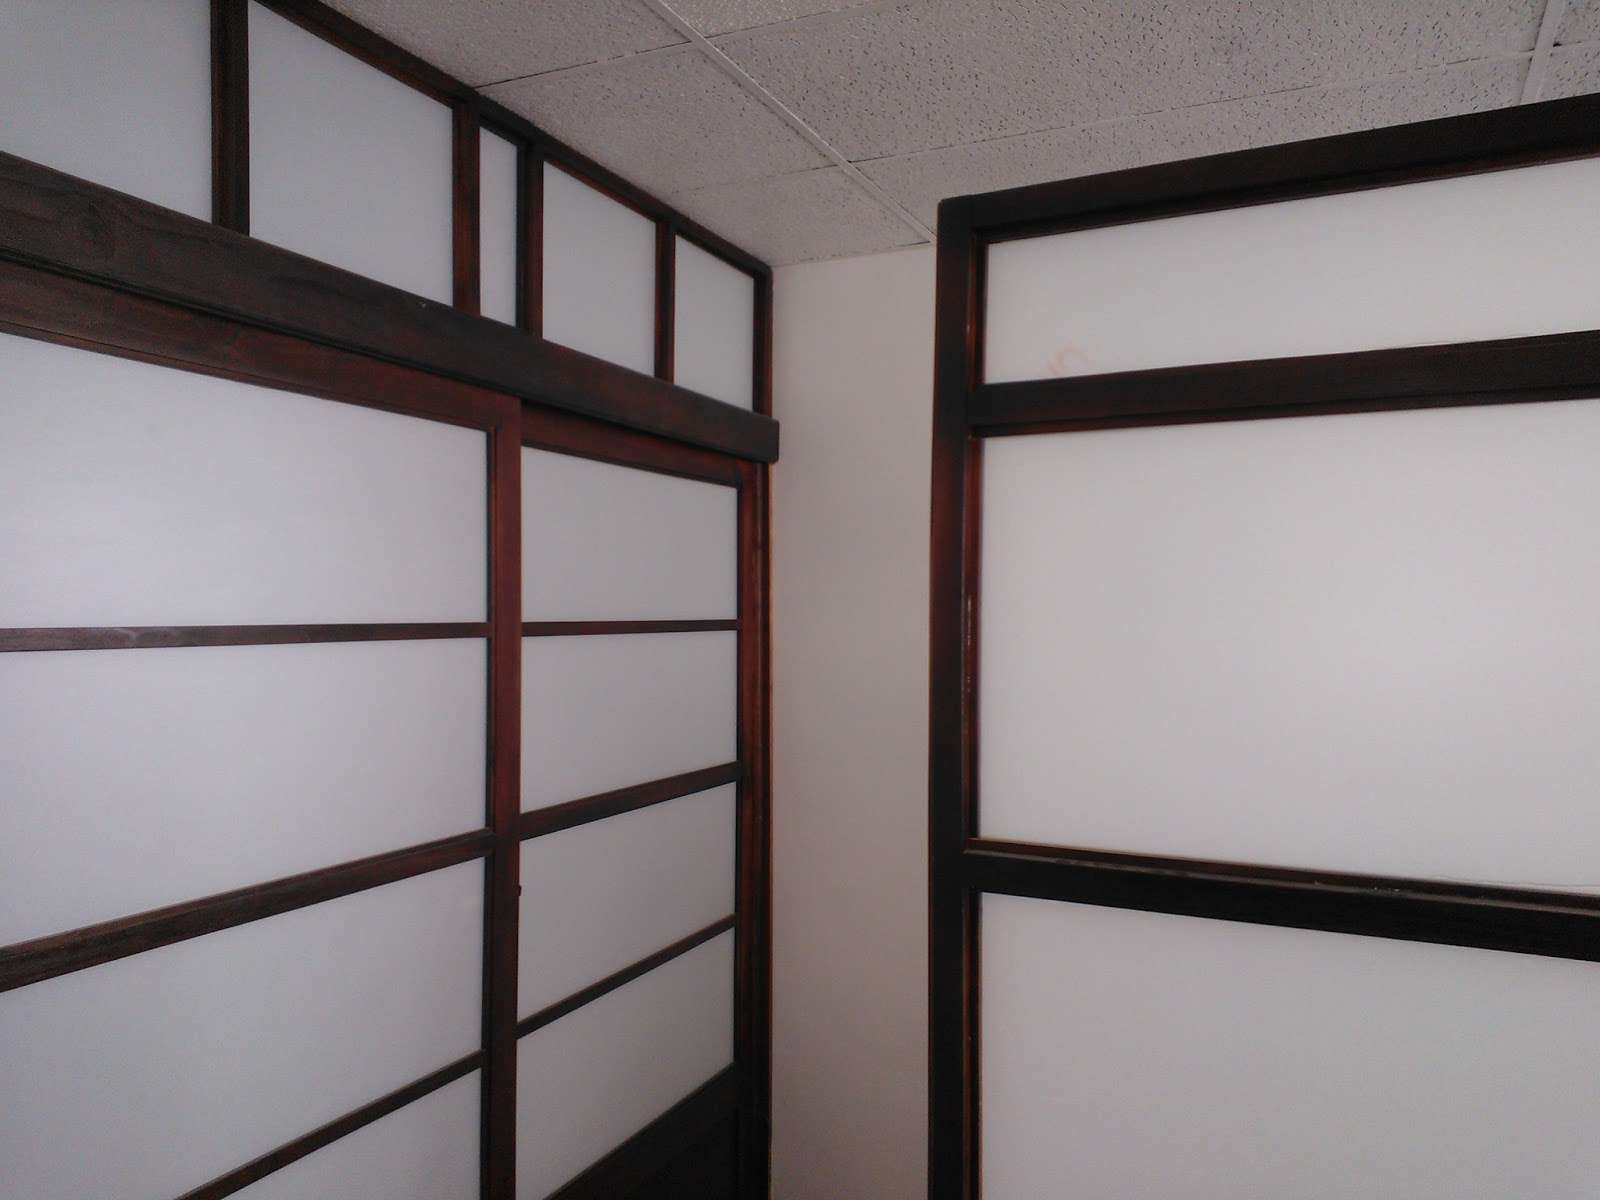 Puertas correderas paneles shoji puertas de madera shoji - Puertas shoji ...